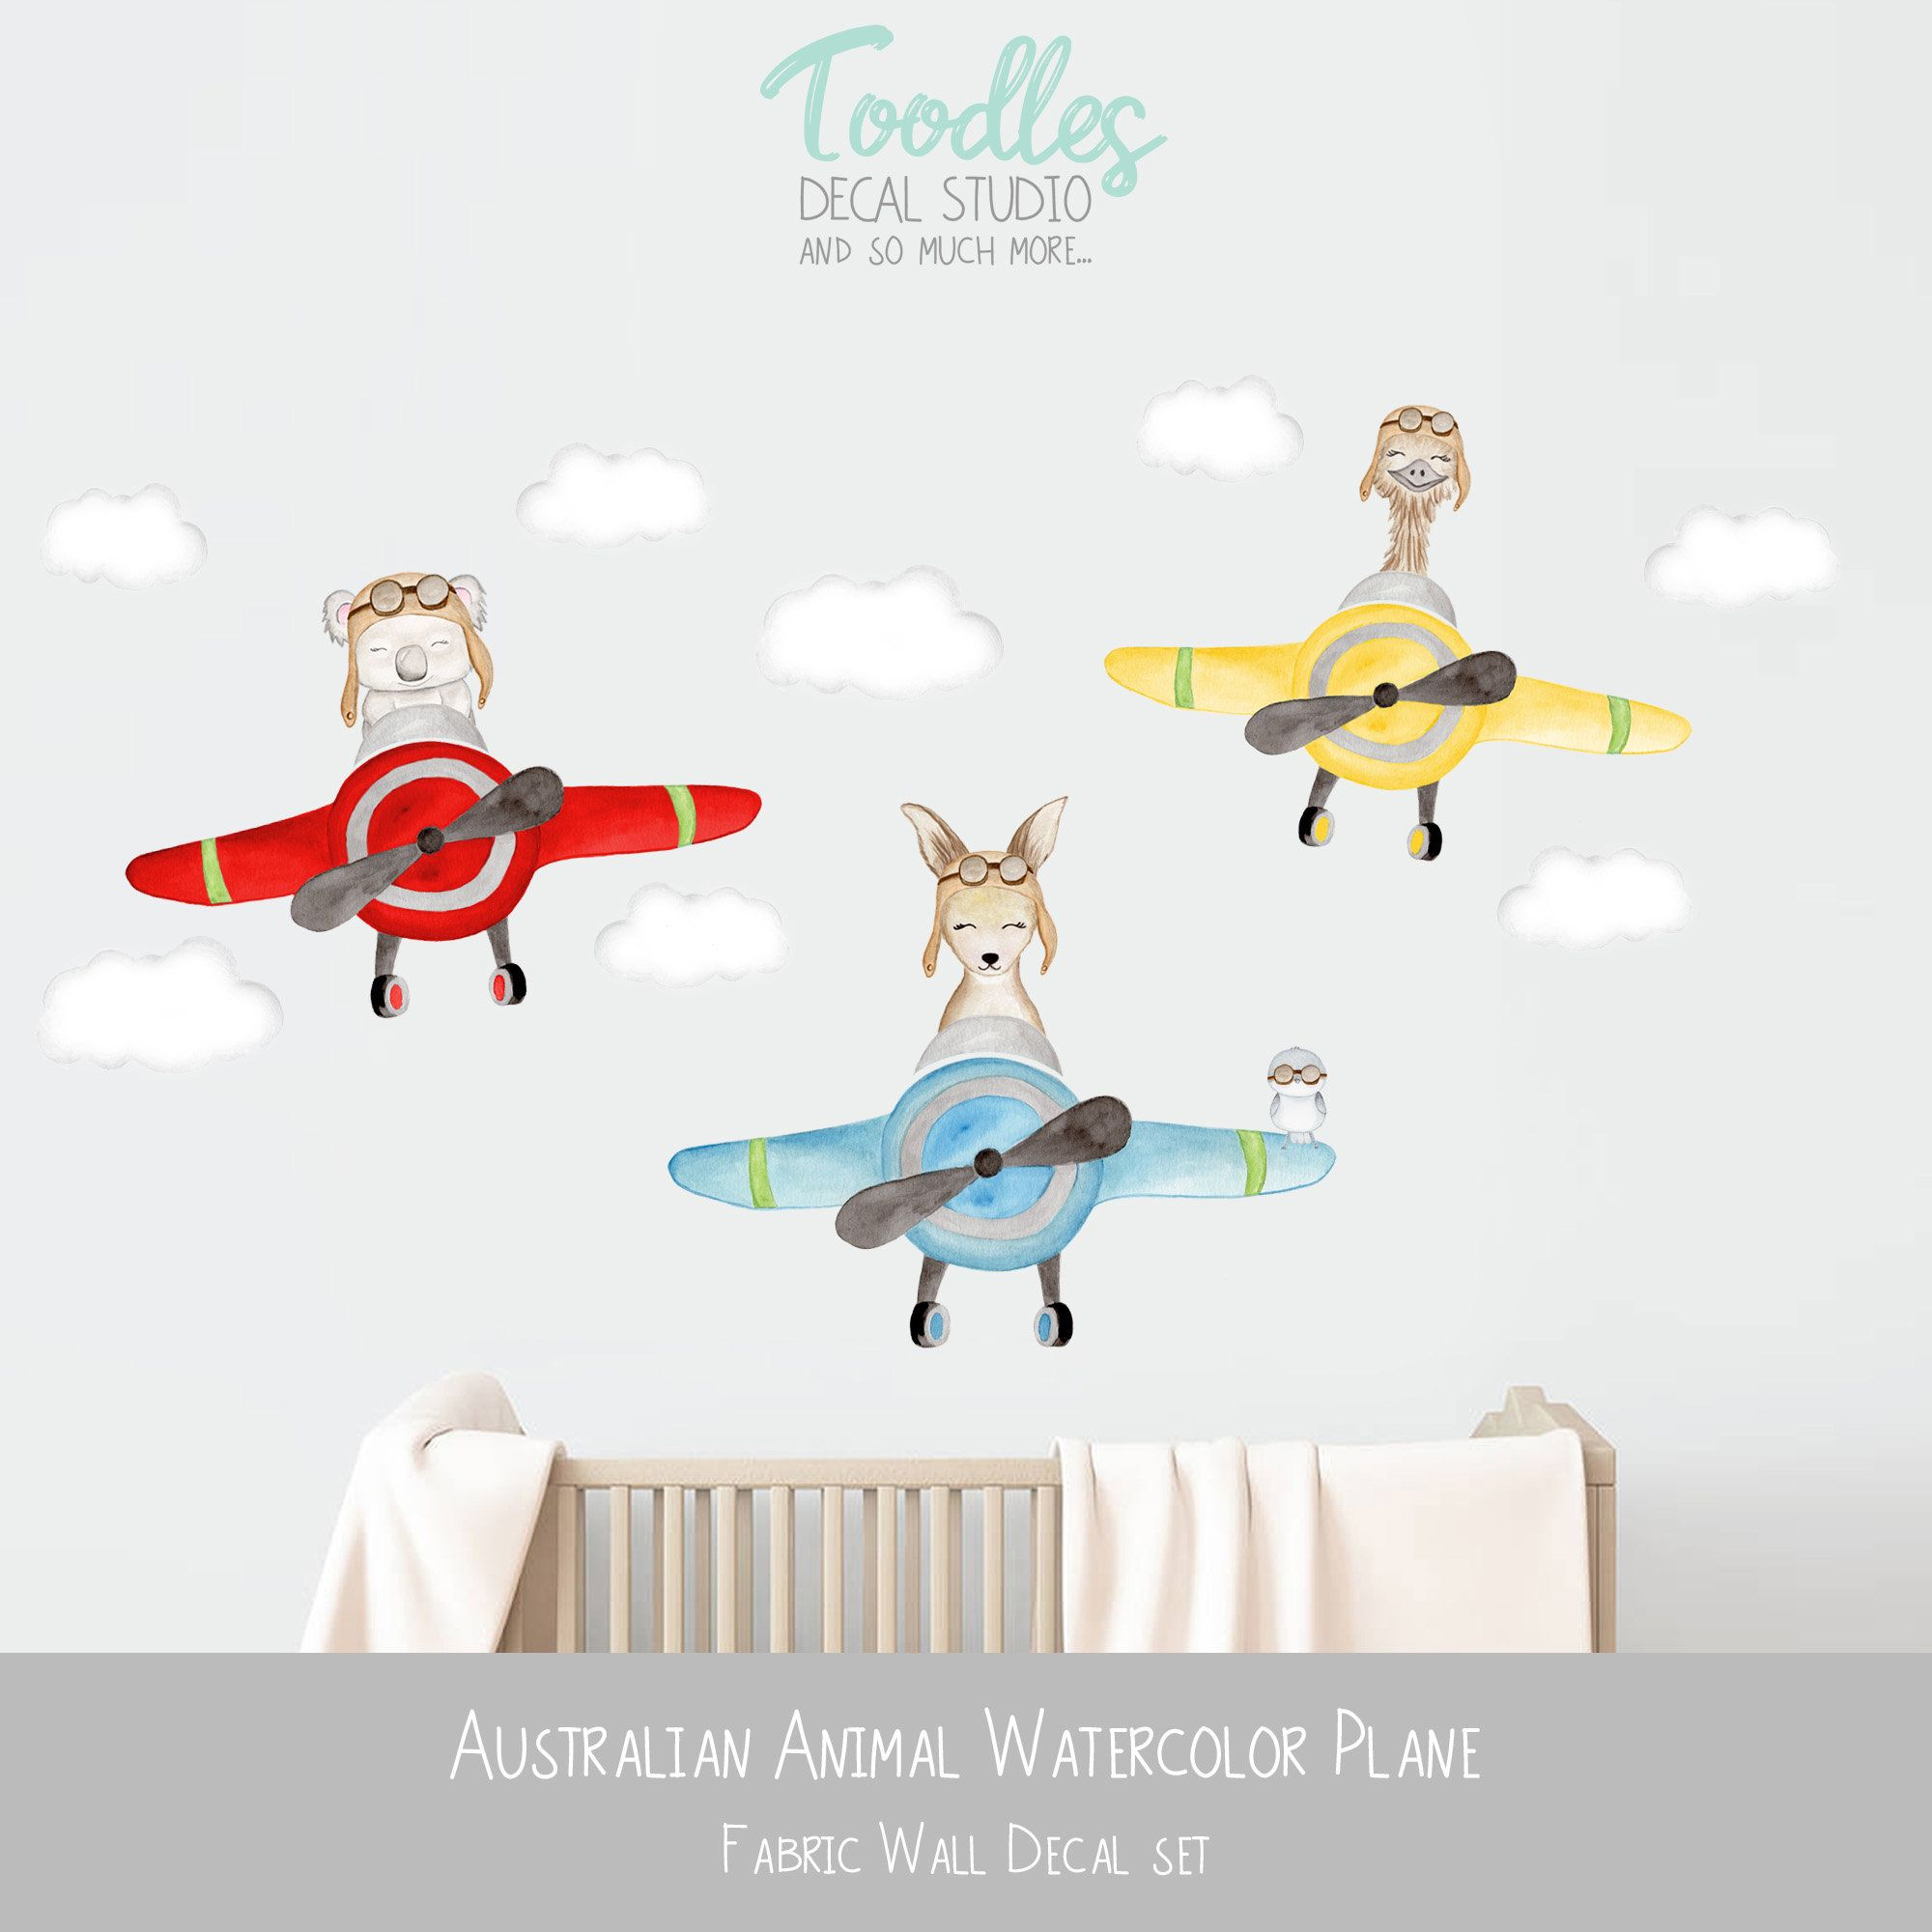 Australian Animal Decal Nursery Art Watercolor Plane Fabric